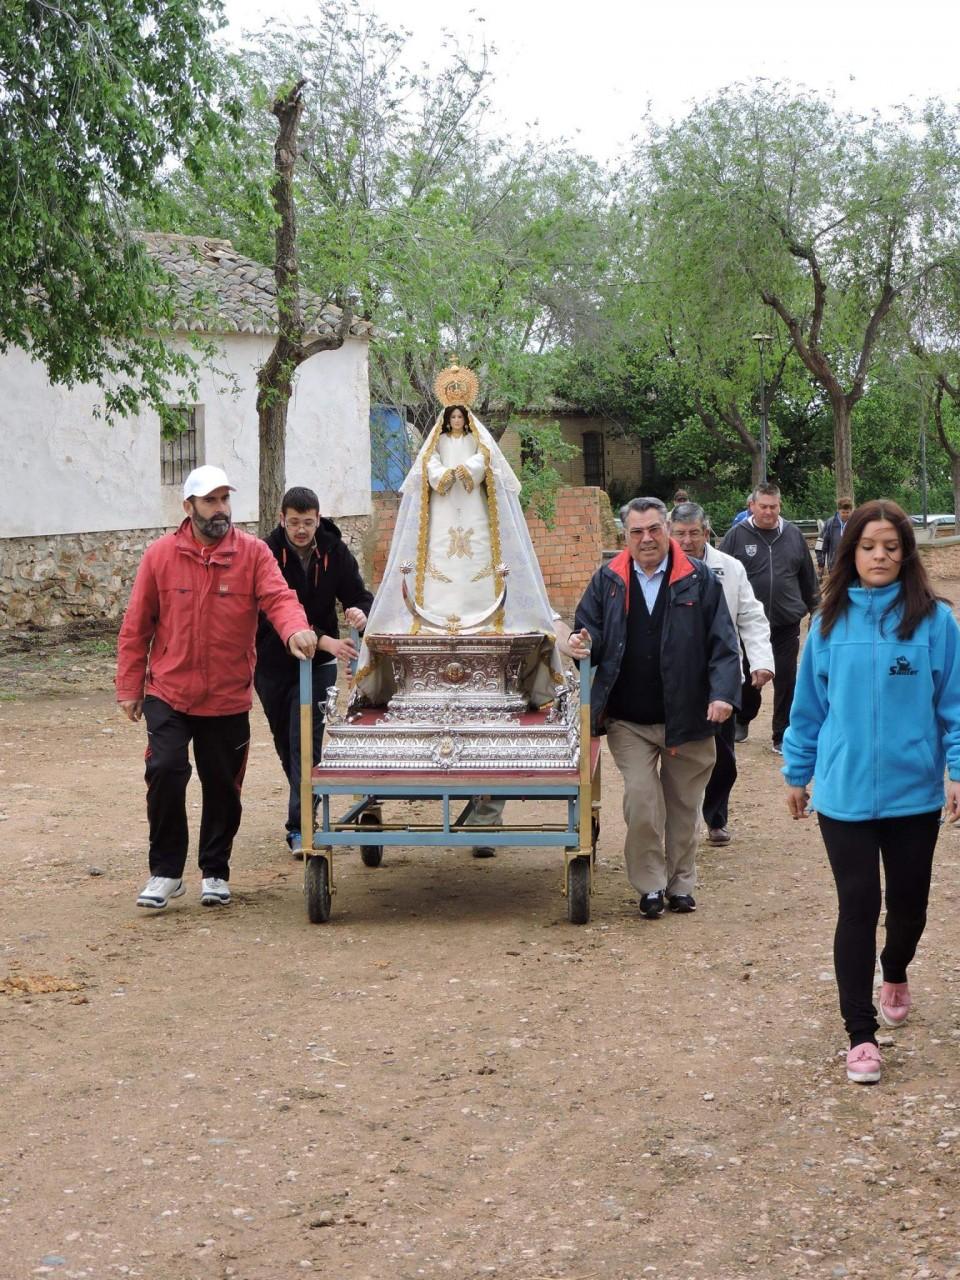 Mayo, mes de romerías en Torralba de Calatrava